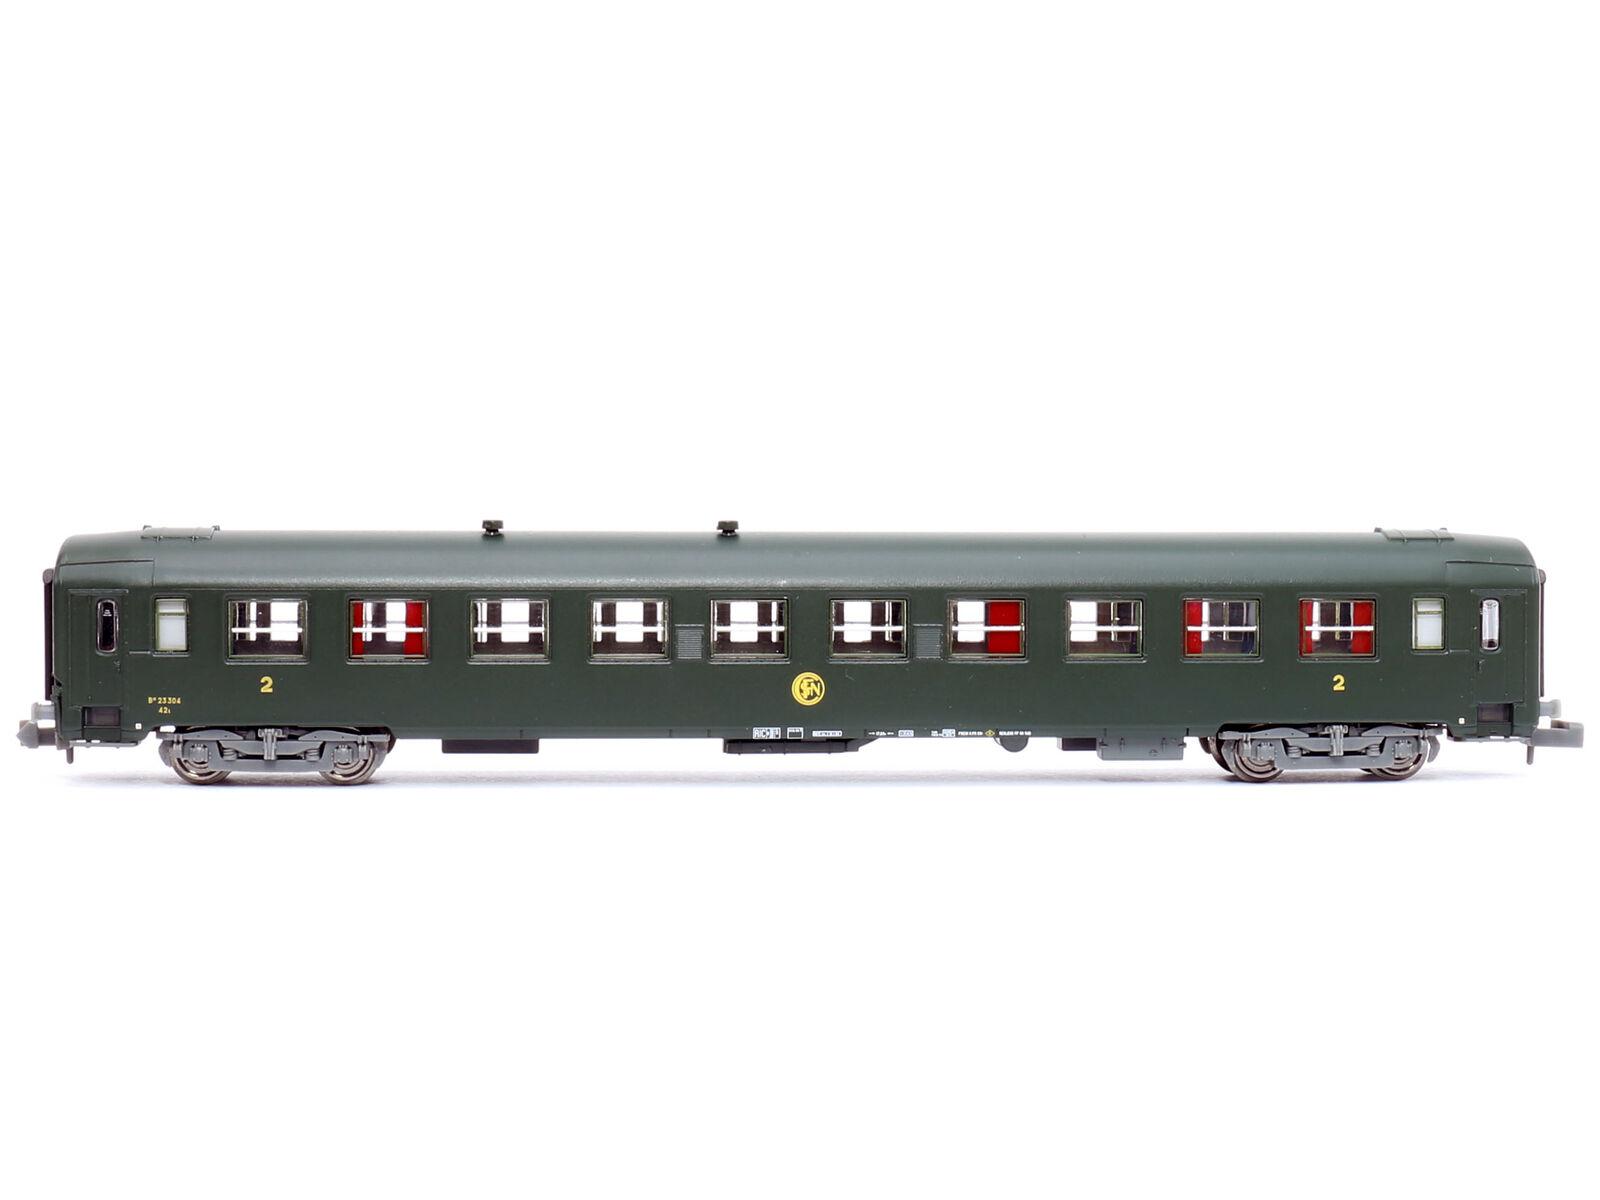 Ree nw-135 - vagoni treno rapido carro UIC rotondo logo EPOCA III-Spur N